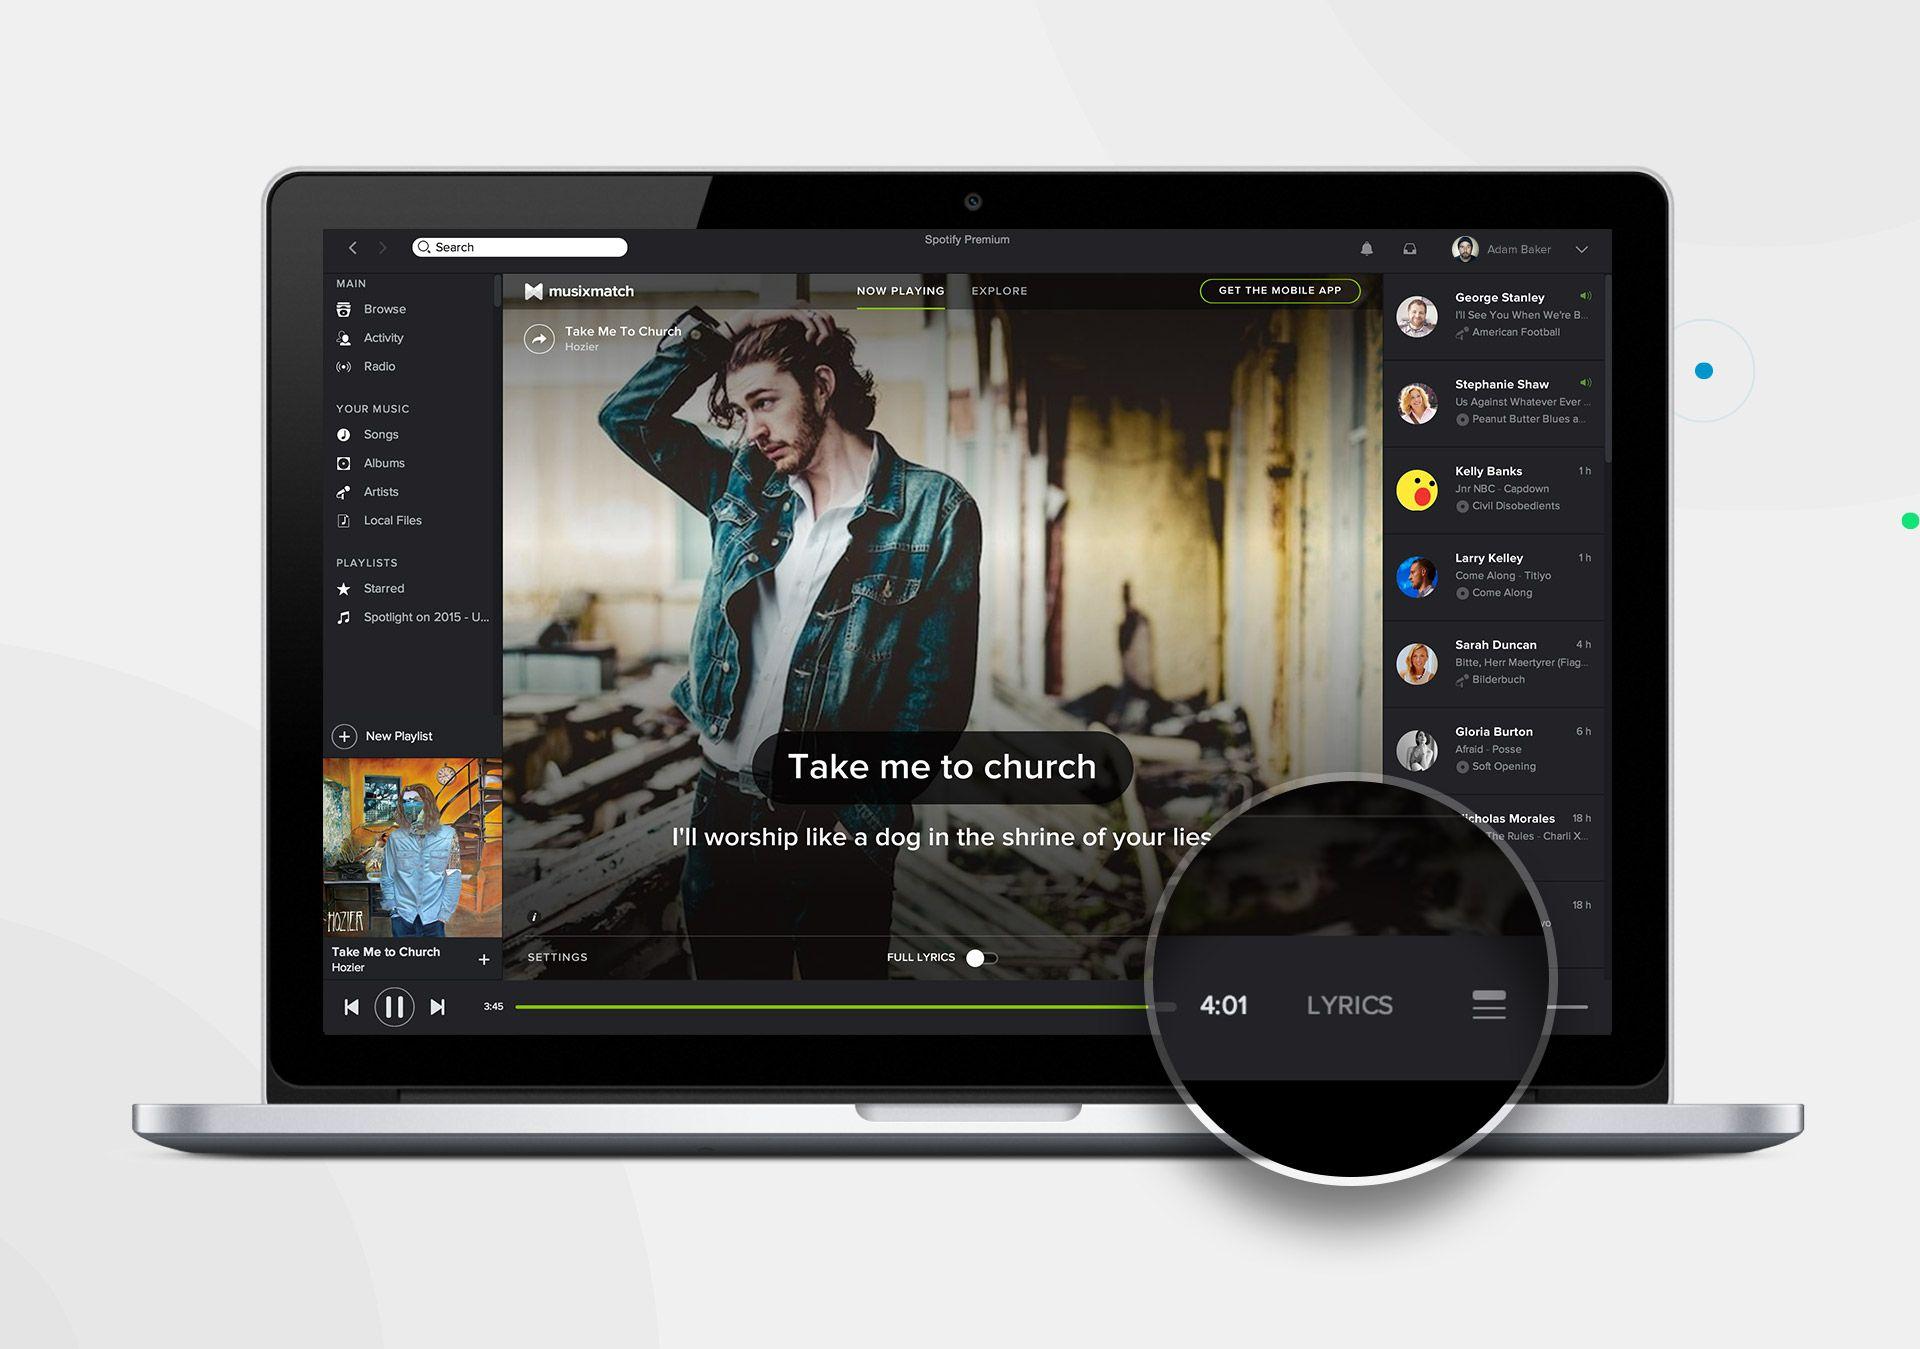 Spotify Desktop Update Adds Full Lyrics from MusixMatch